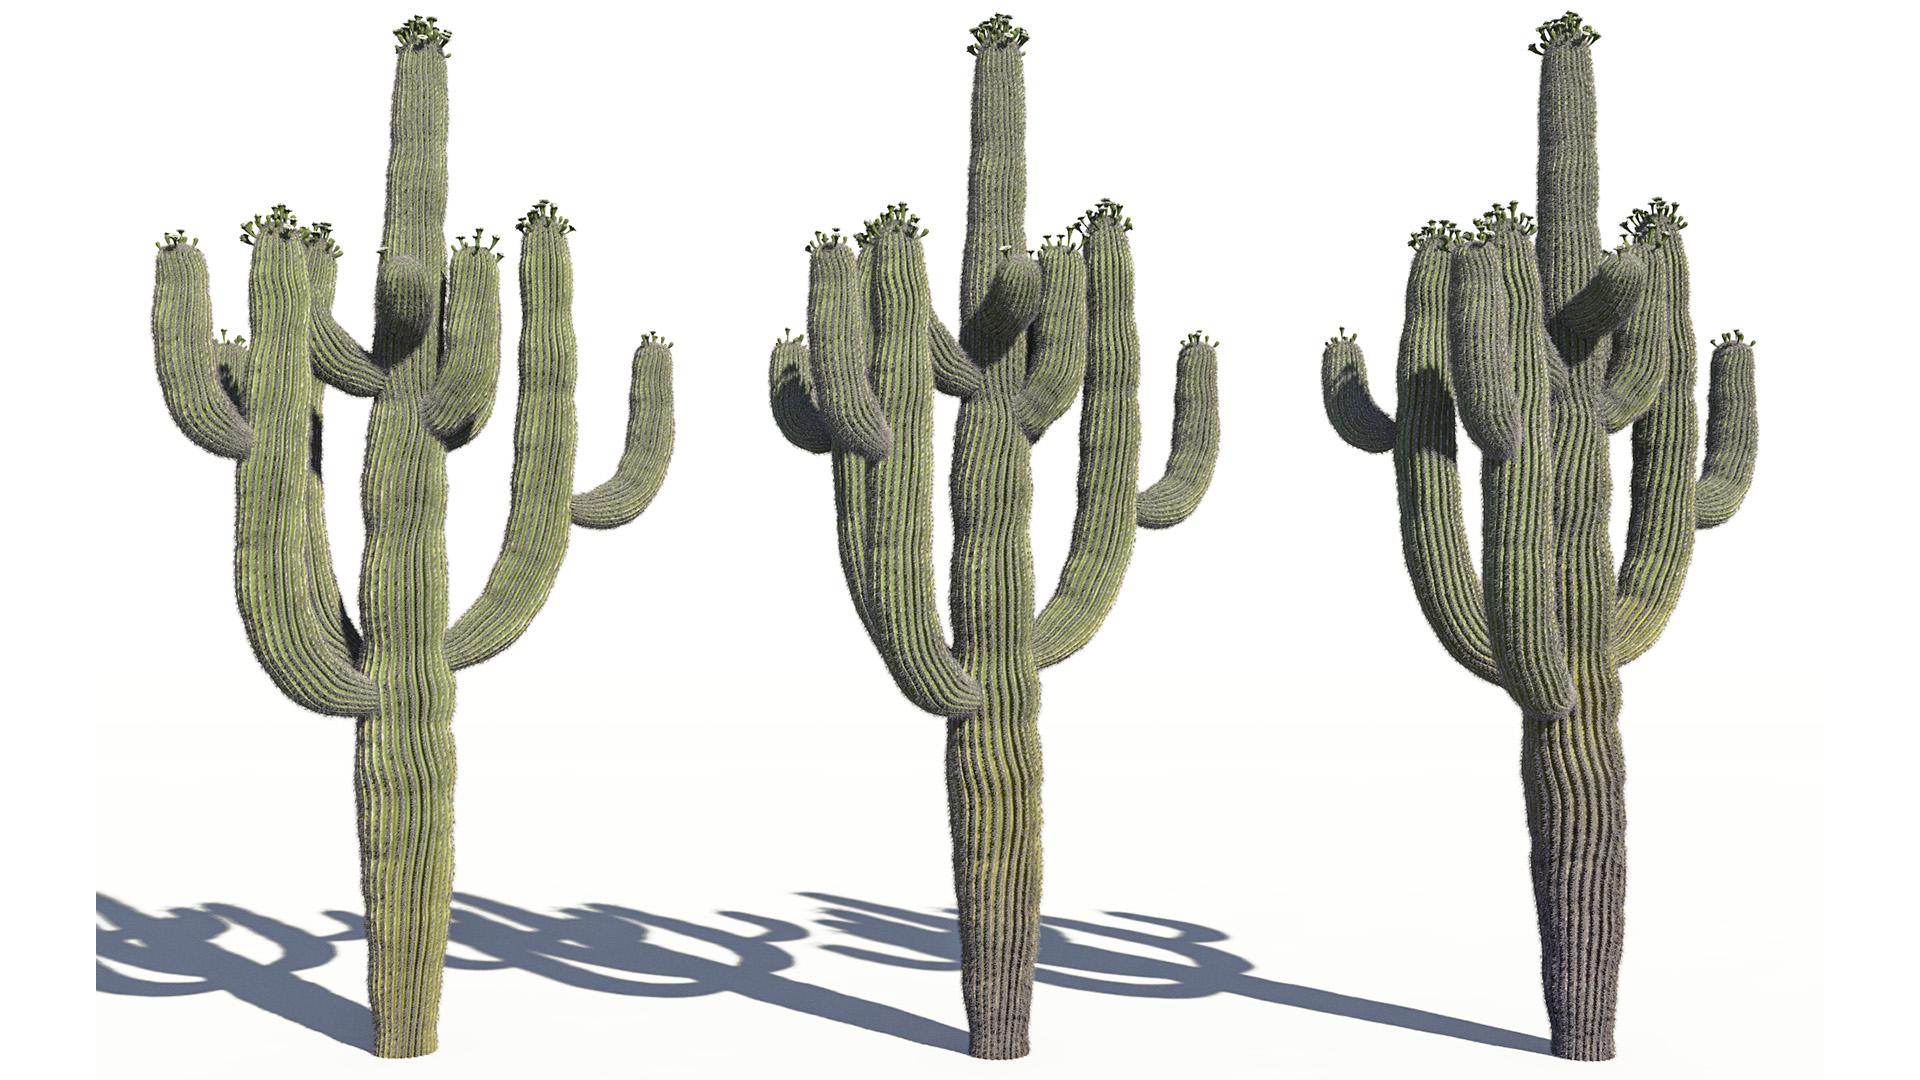 3D model of the Saguaro cactus Carnegiea gigantea health variations